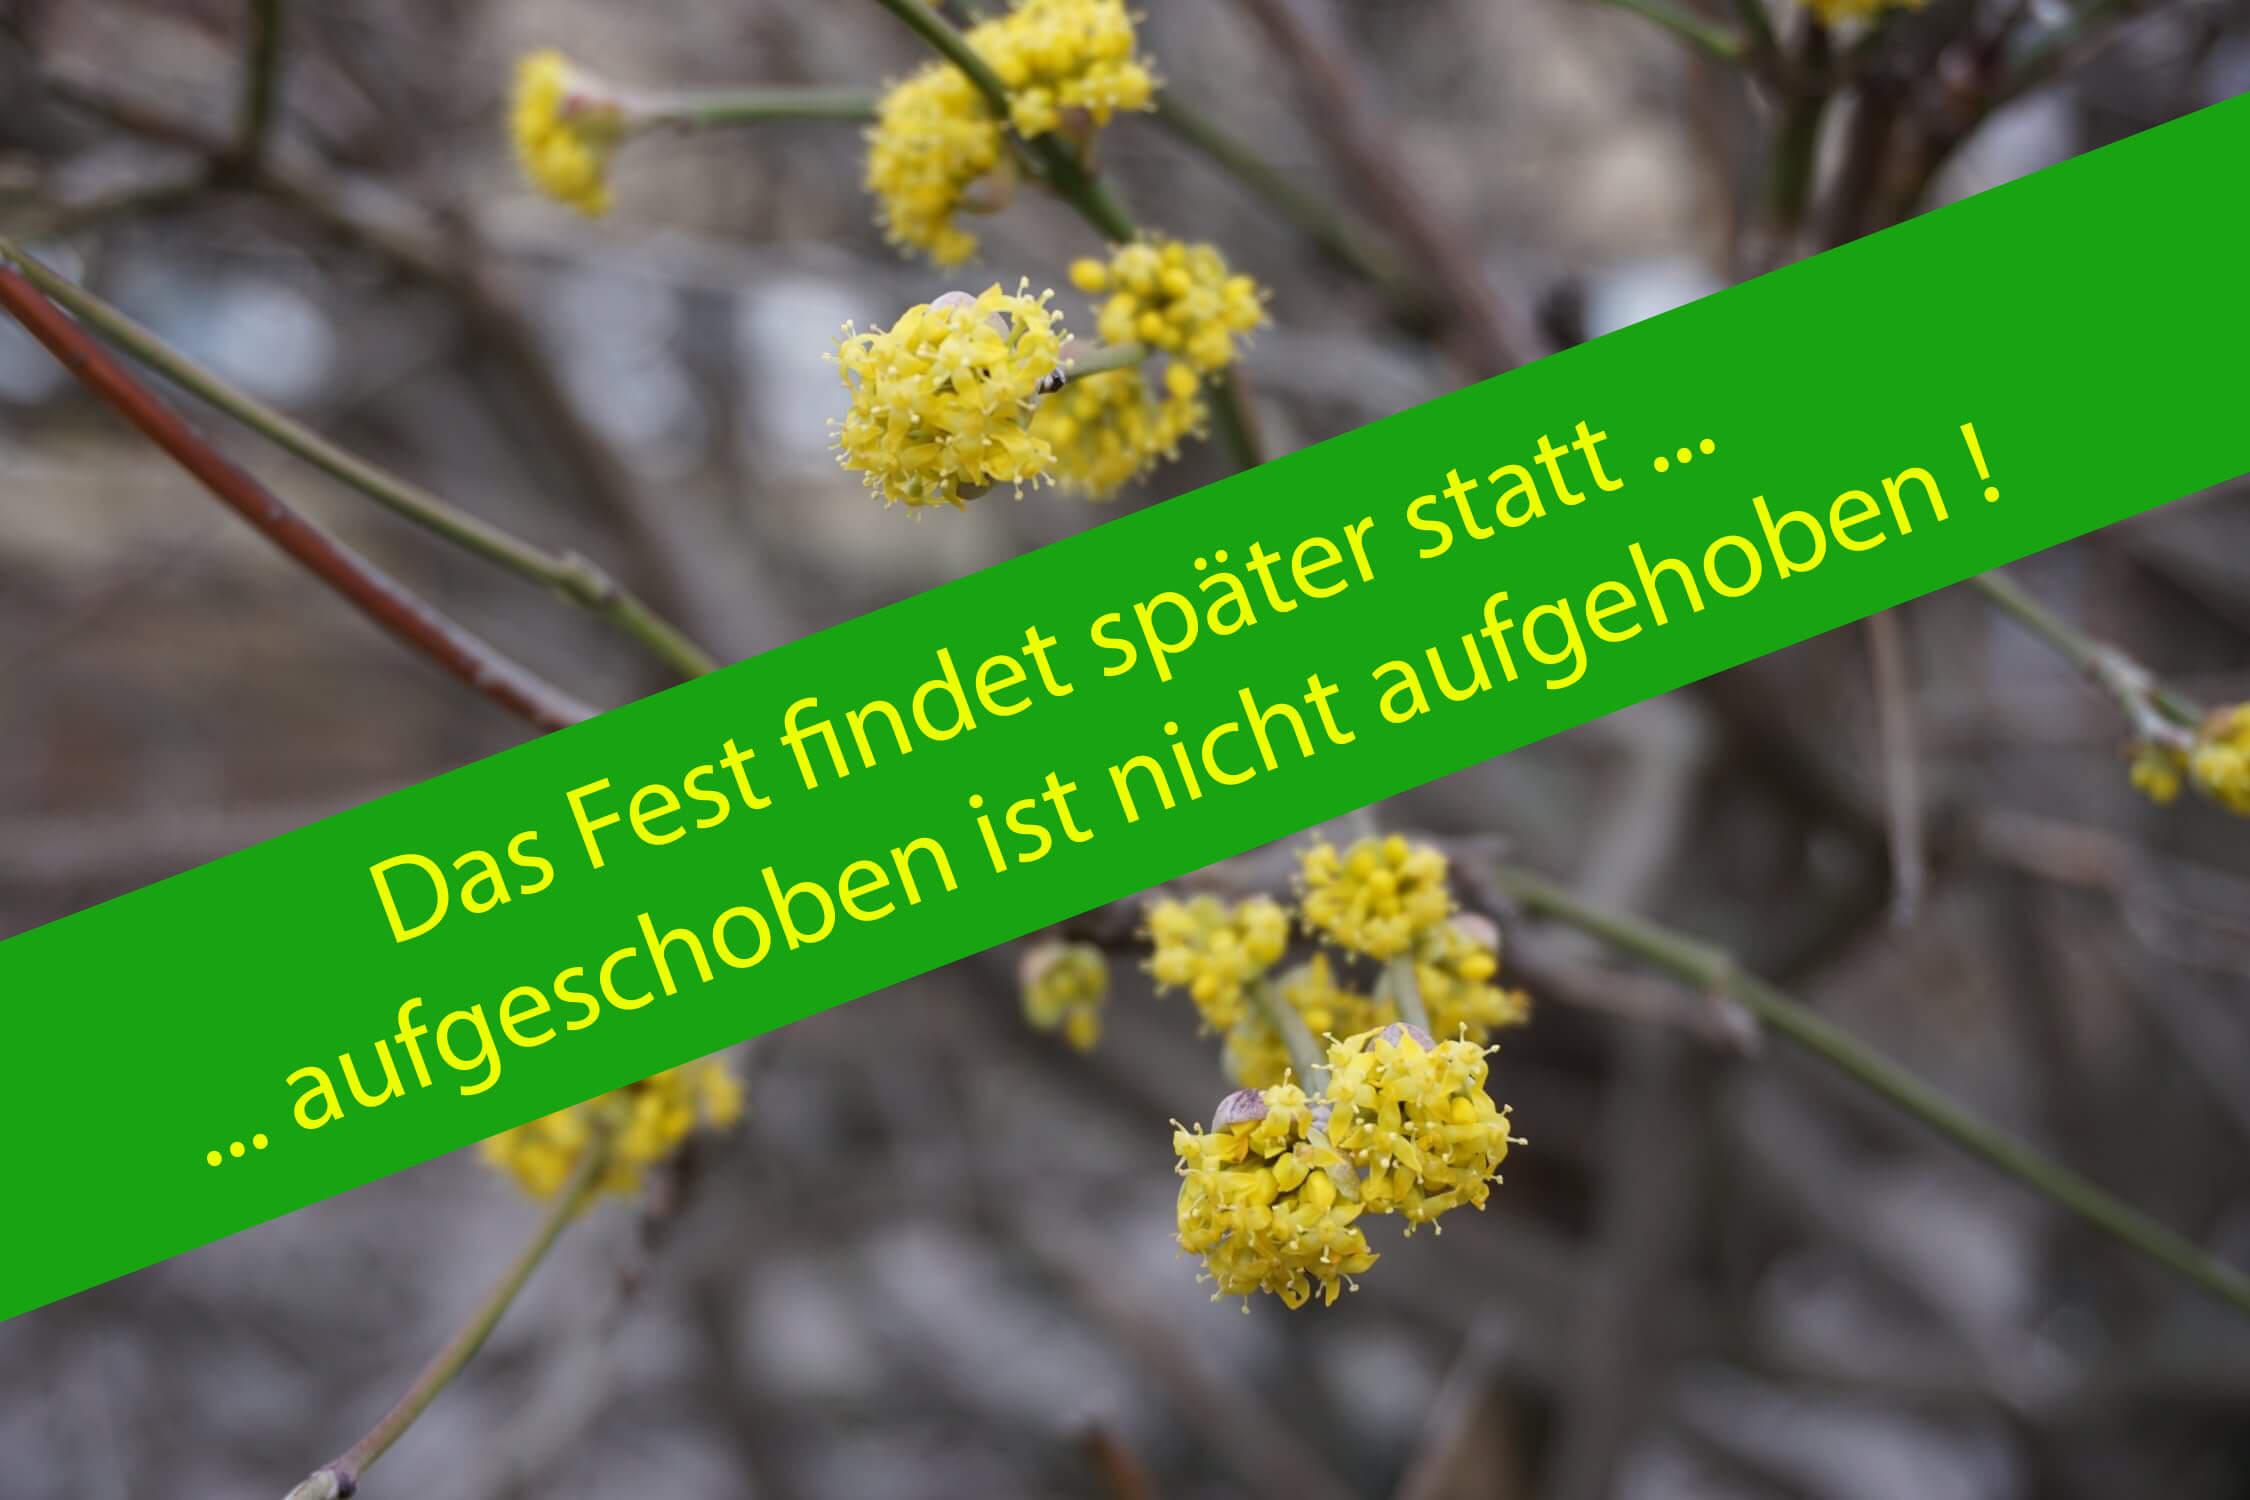 Internationales Frühlingsfest in Altglienicke ist verschoben